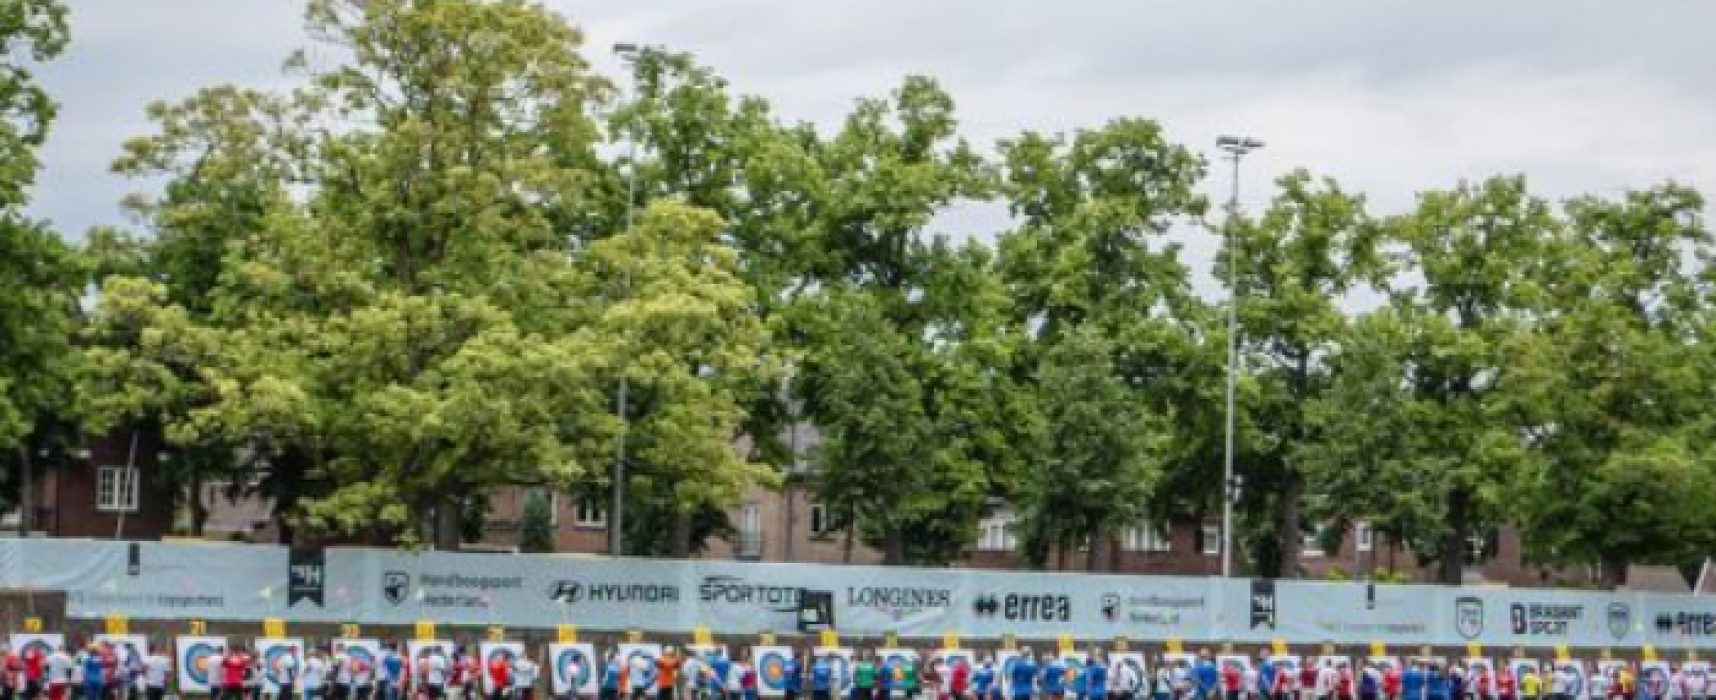 H World Archery αναγνωρίζει και πάλι τους εθνικούς αγώνες